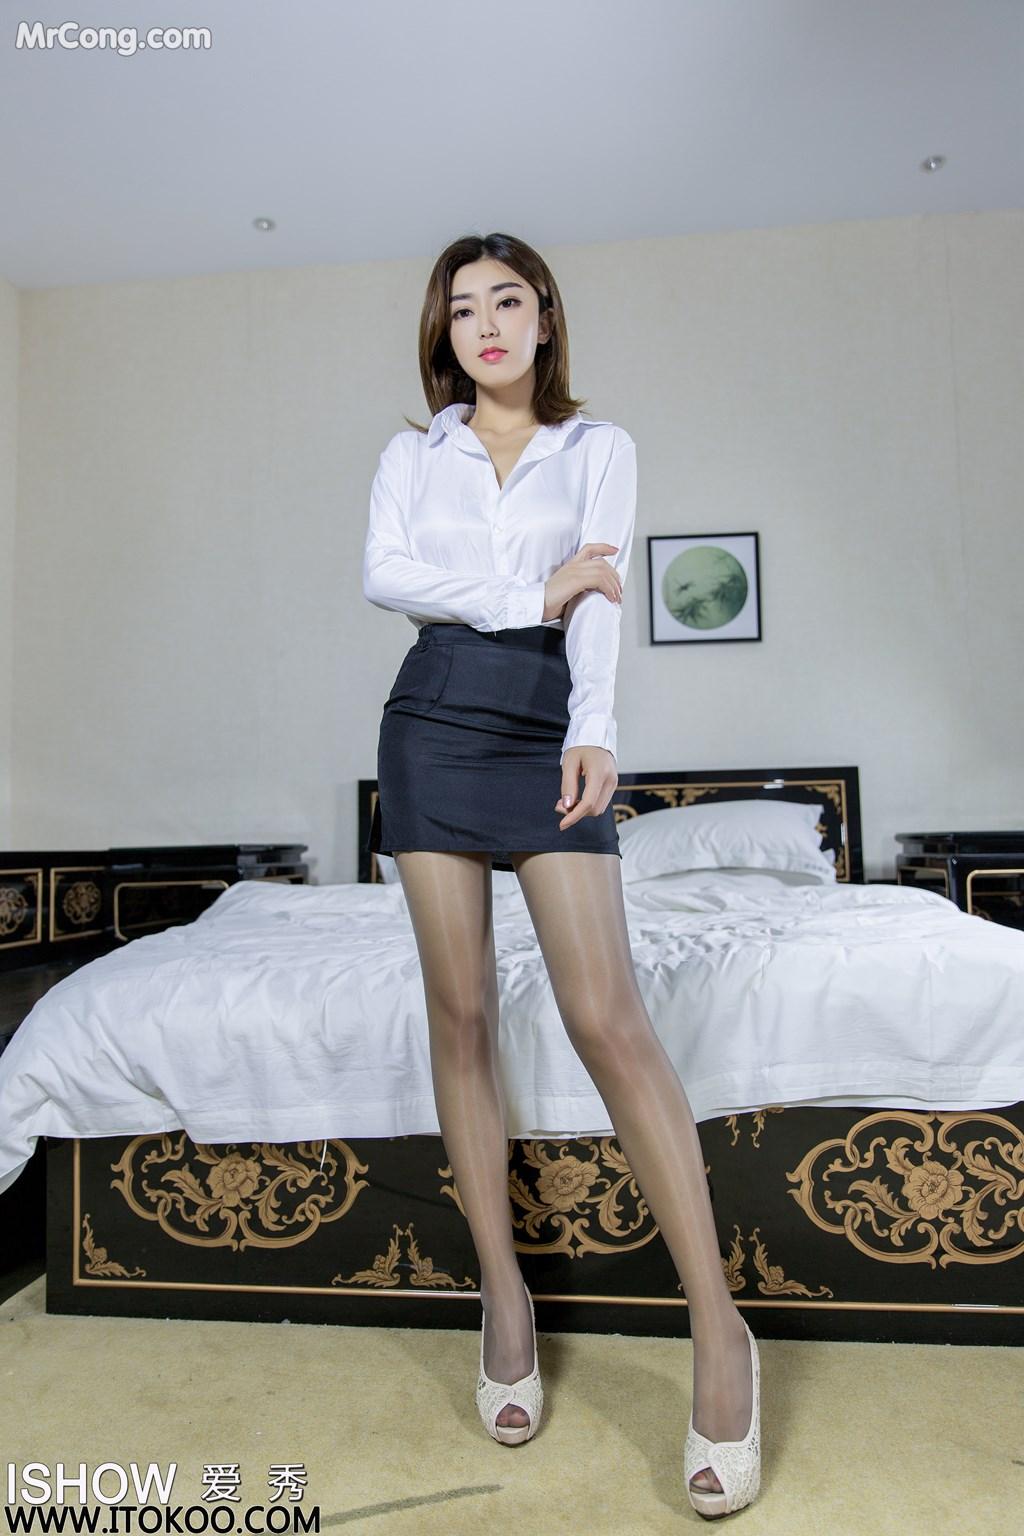 Image ISHOW-No.153-Caroline-MrCong.com-001 in post ISHOW No.153: Người mẫu 林琳Caroline (31 ảnh)